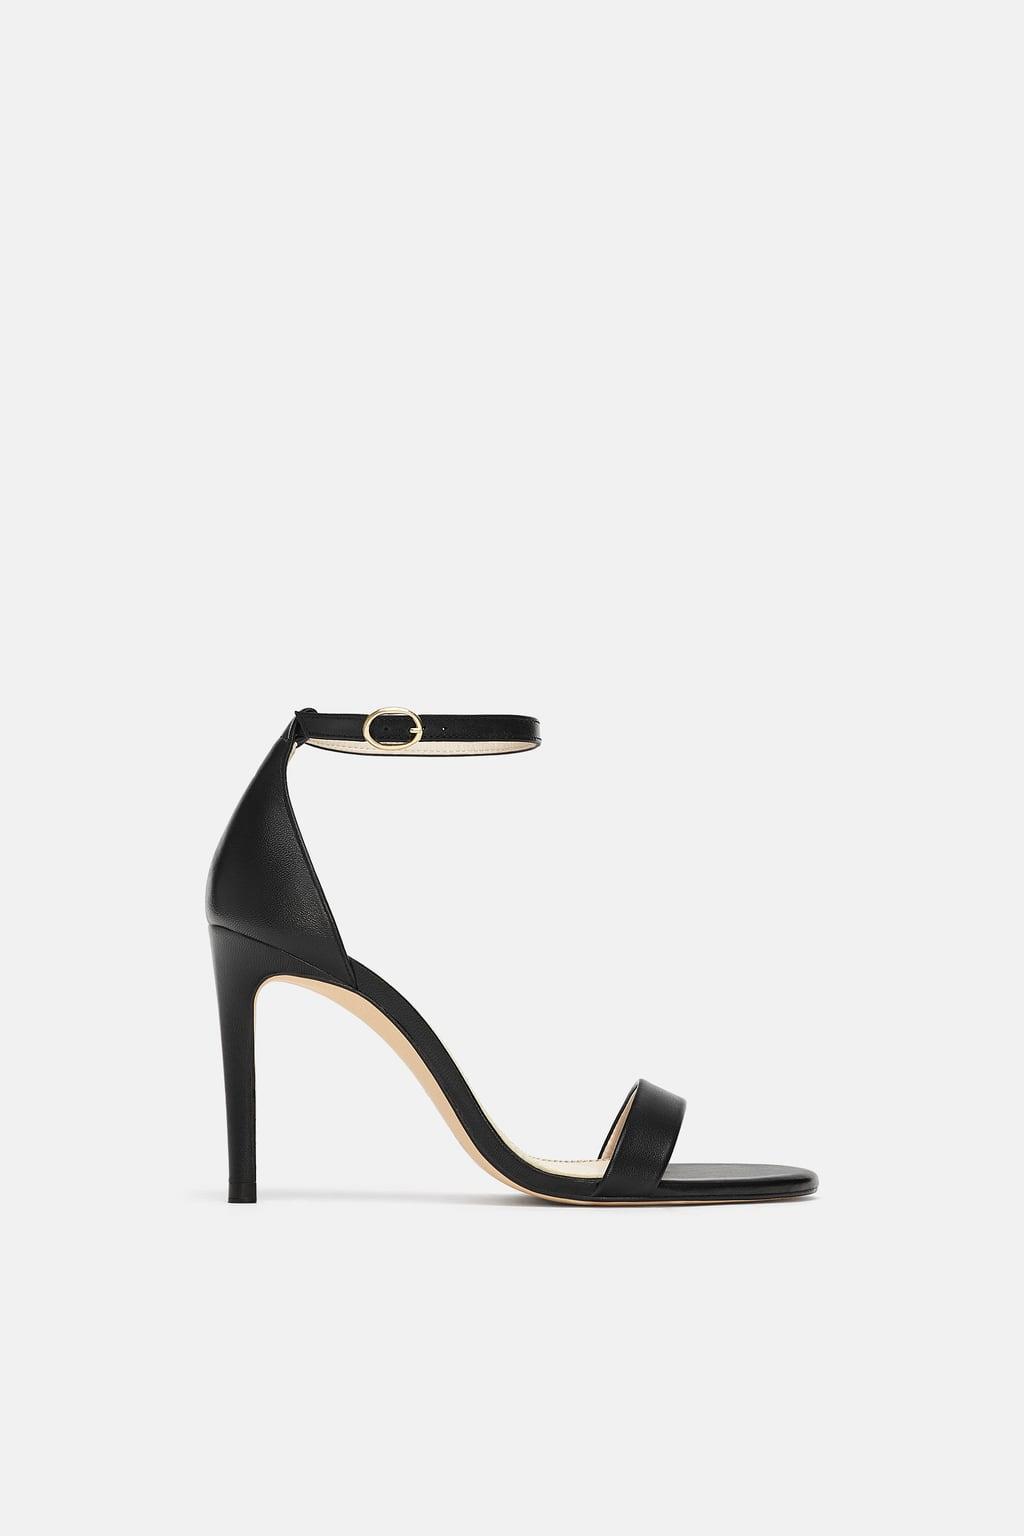 zapatos de pulsera para piernas delgadas